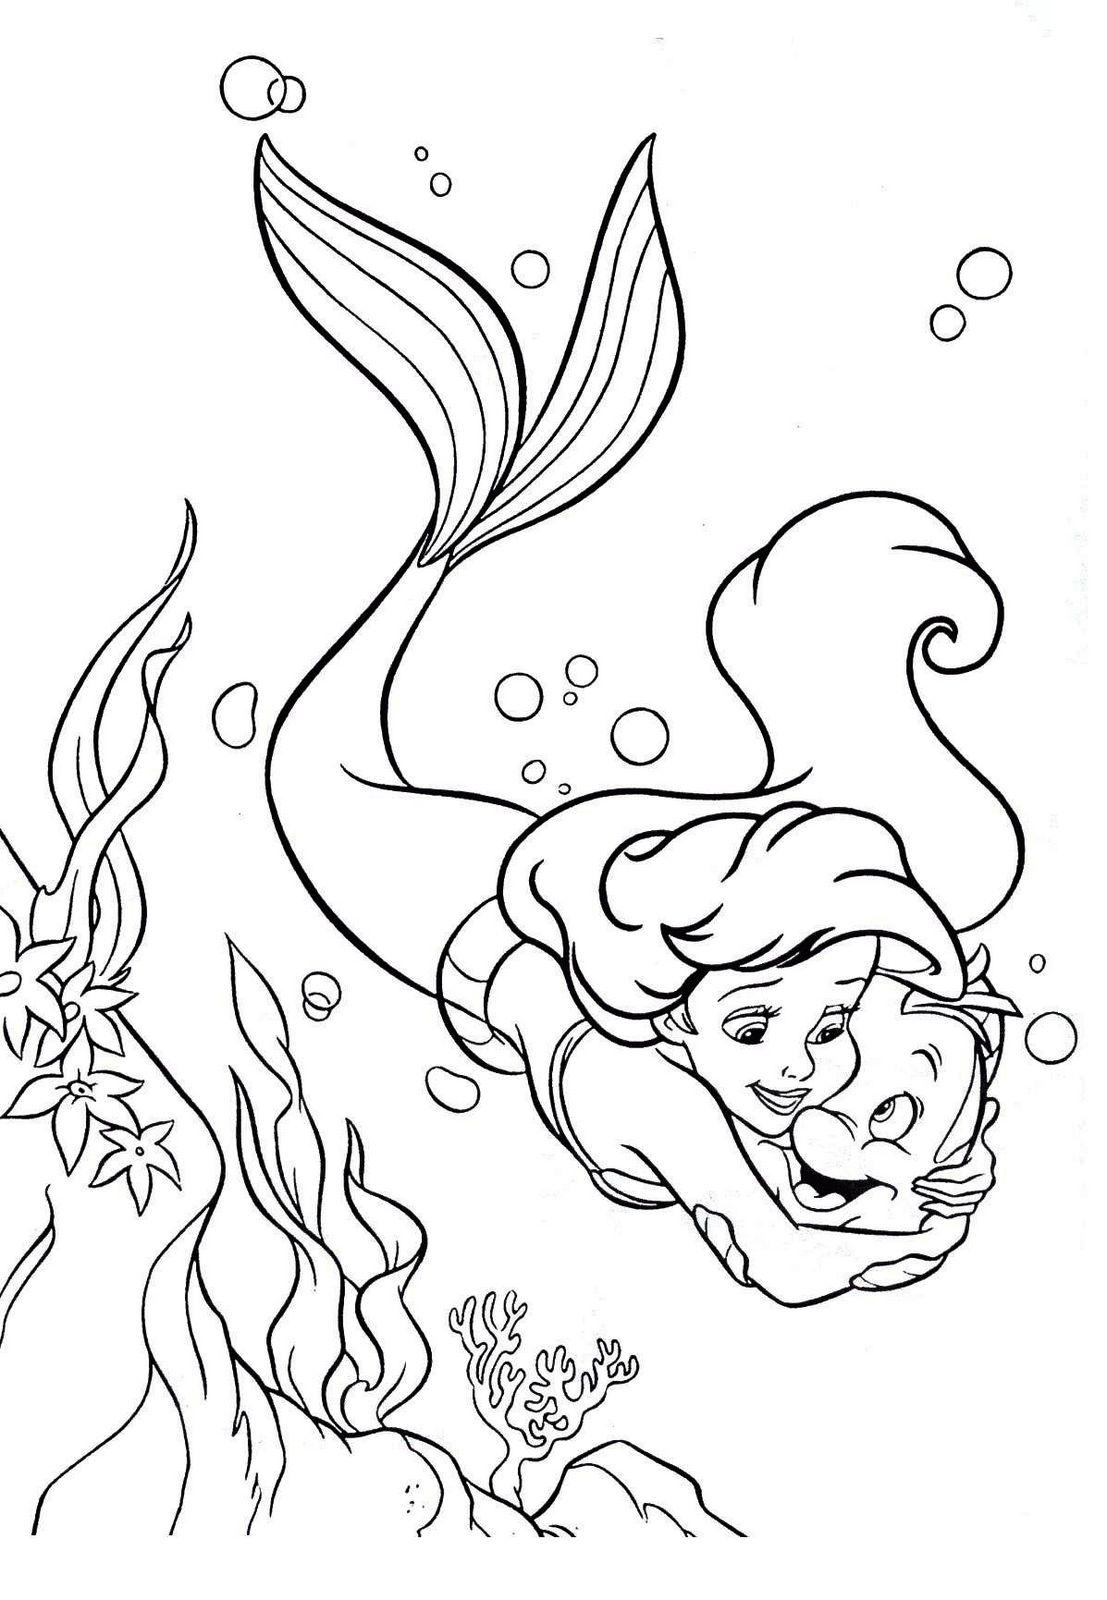 Ariel para Colorir e Imprimir Muito Fcil Colorir e Pintar